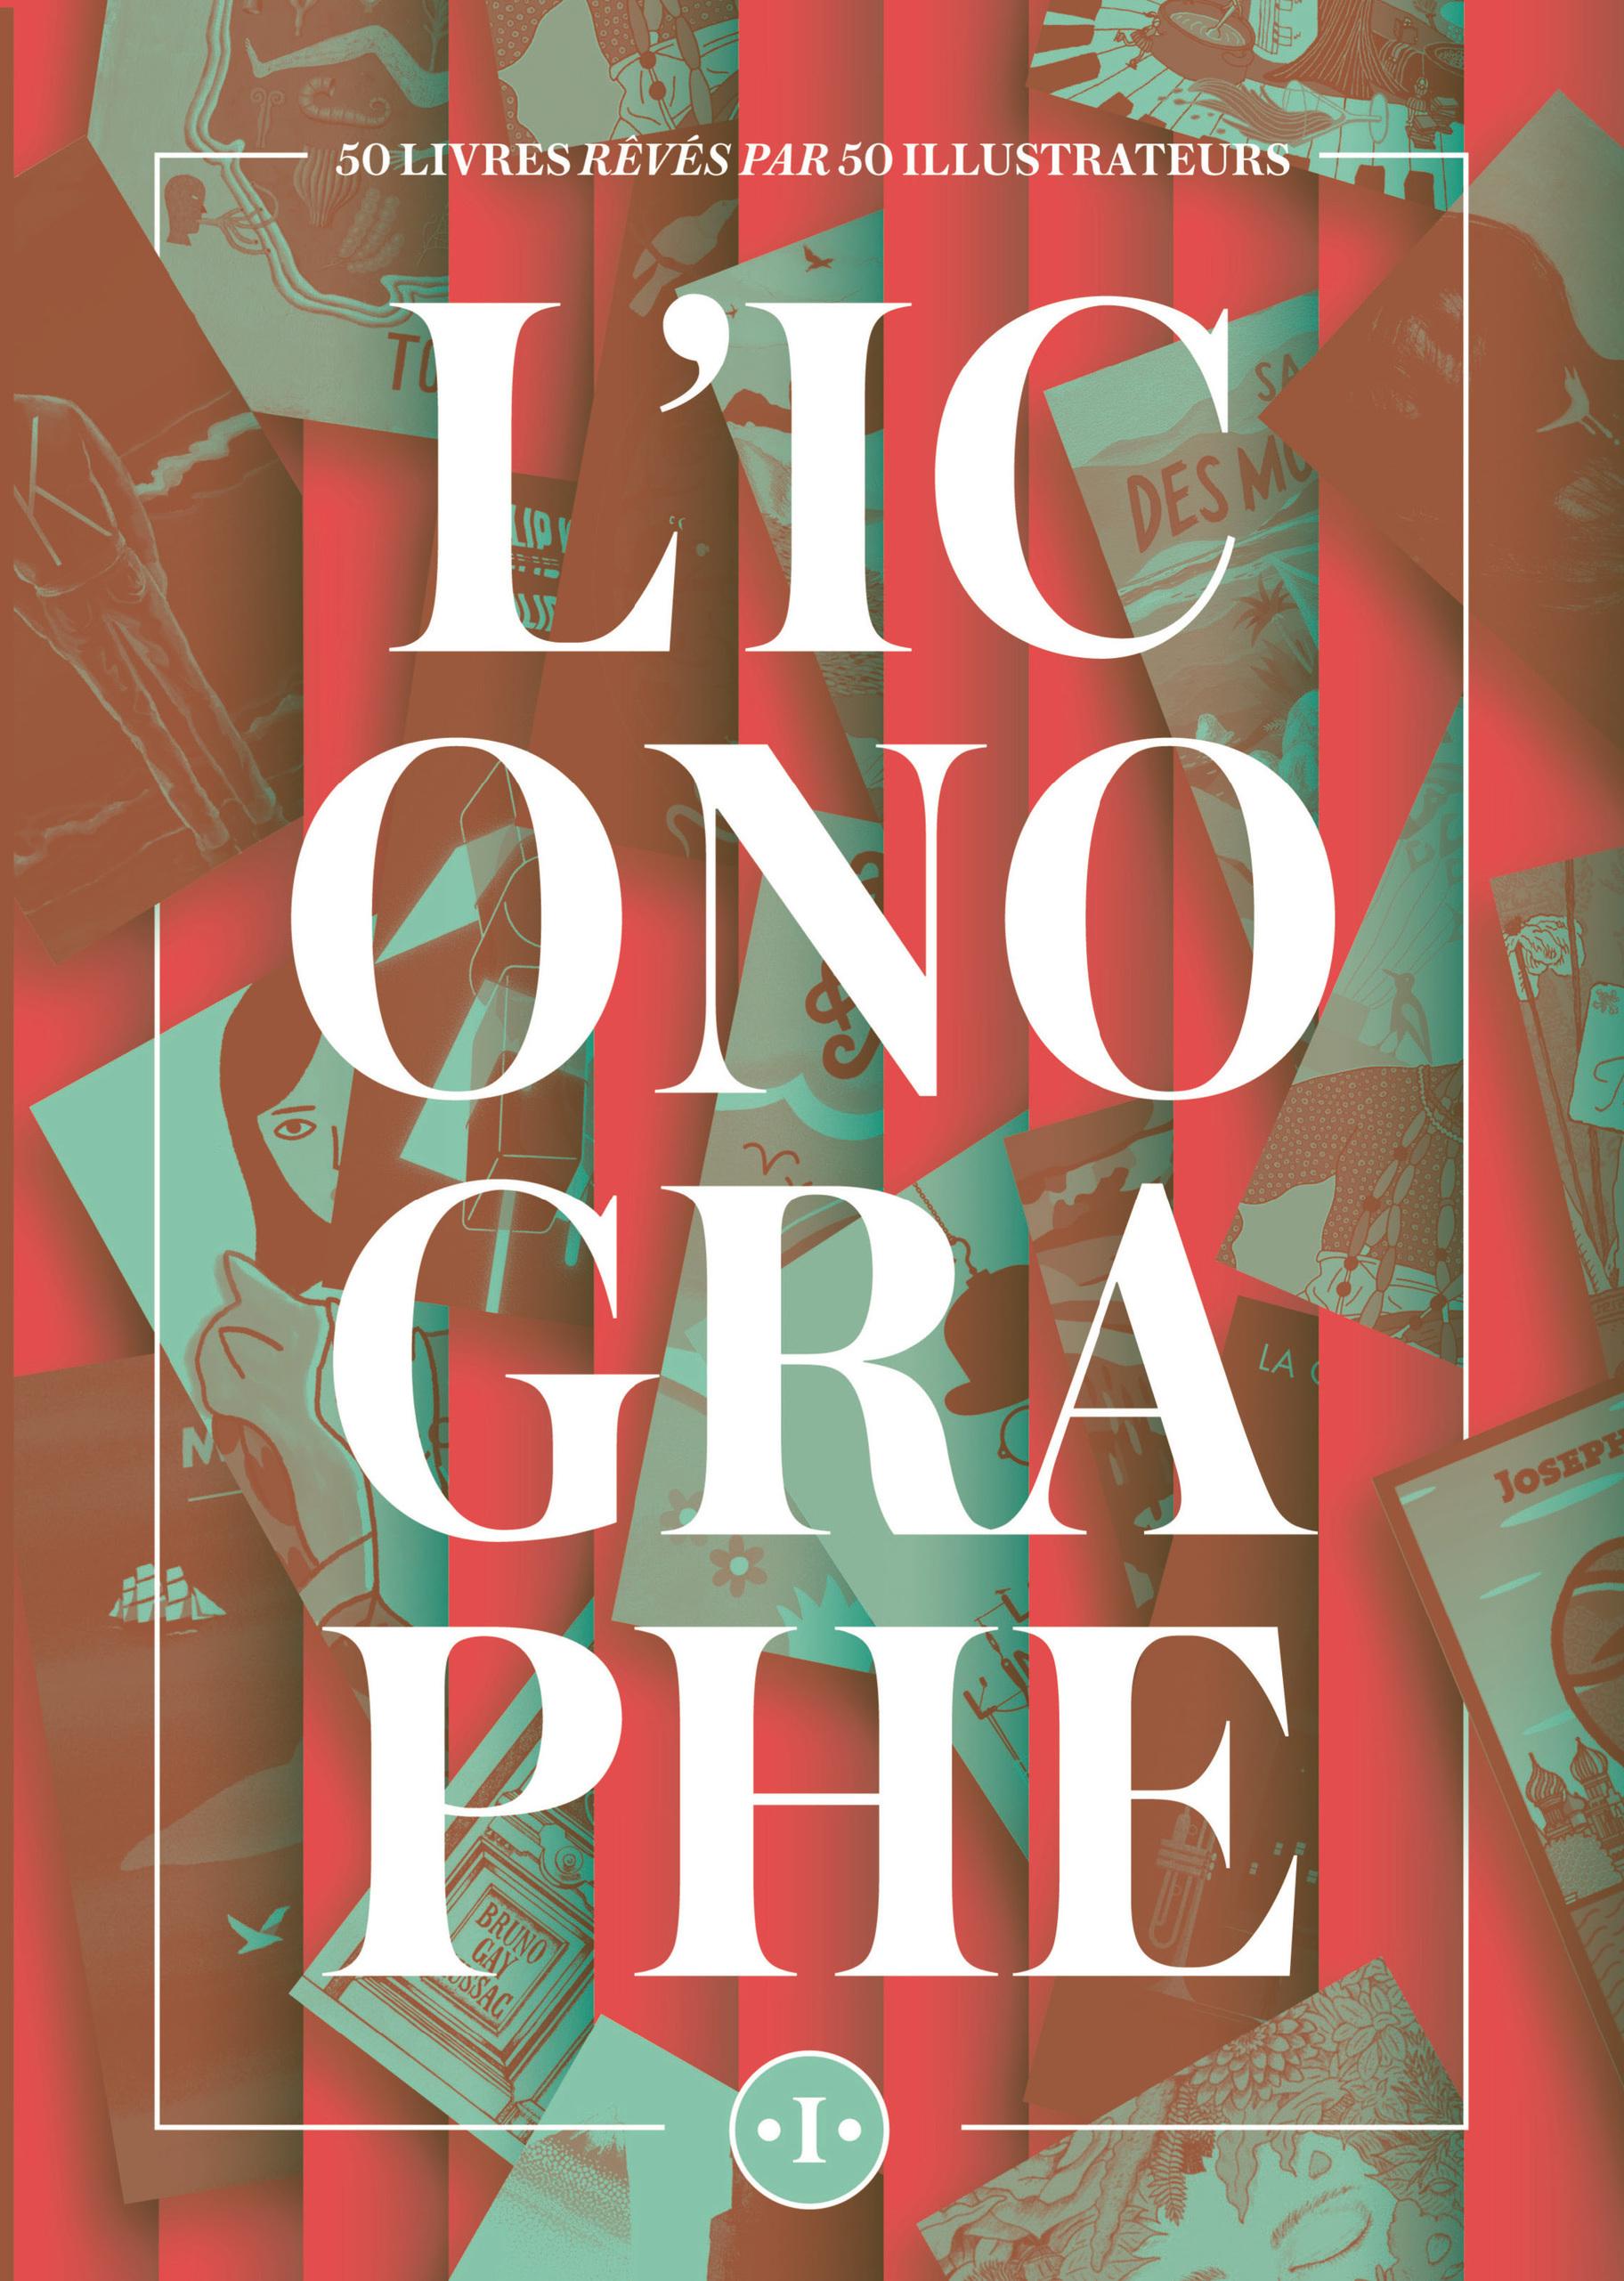 L'ICONOGRAPHE